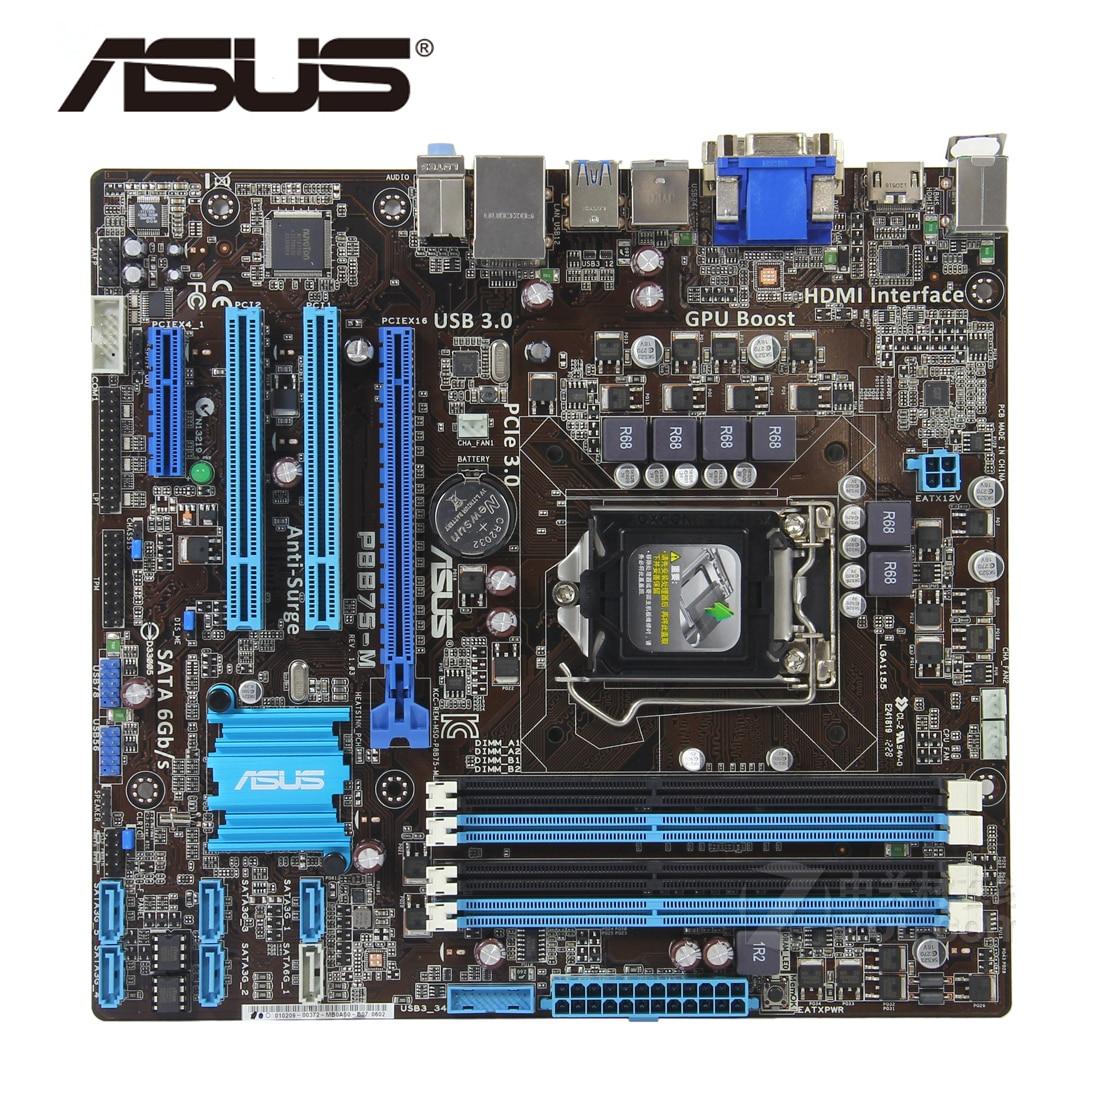 LGA 1155 ASUS P8B75-M P8B75M B75 100% Original/CSM Motherboard Soquete SATA III 4 x DDR3 32GB USB3.0 p8B75-M/CSM Mainboard Usado